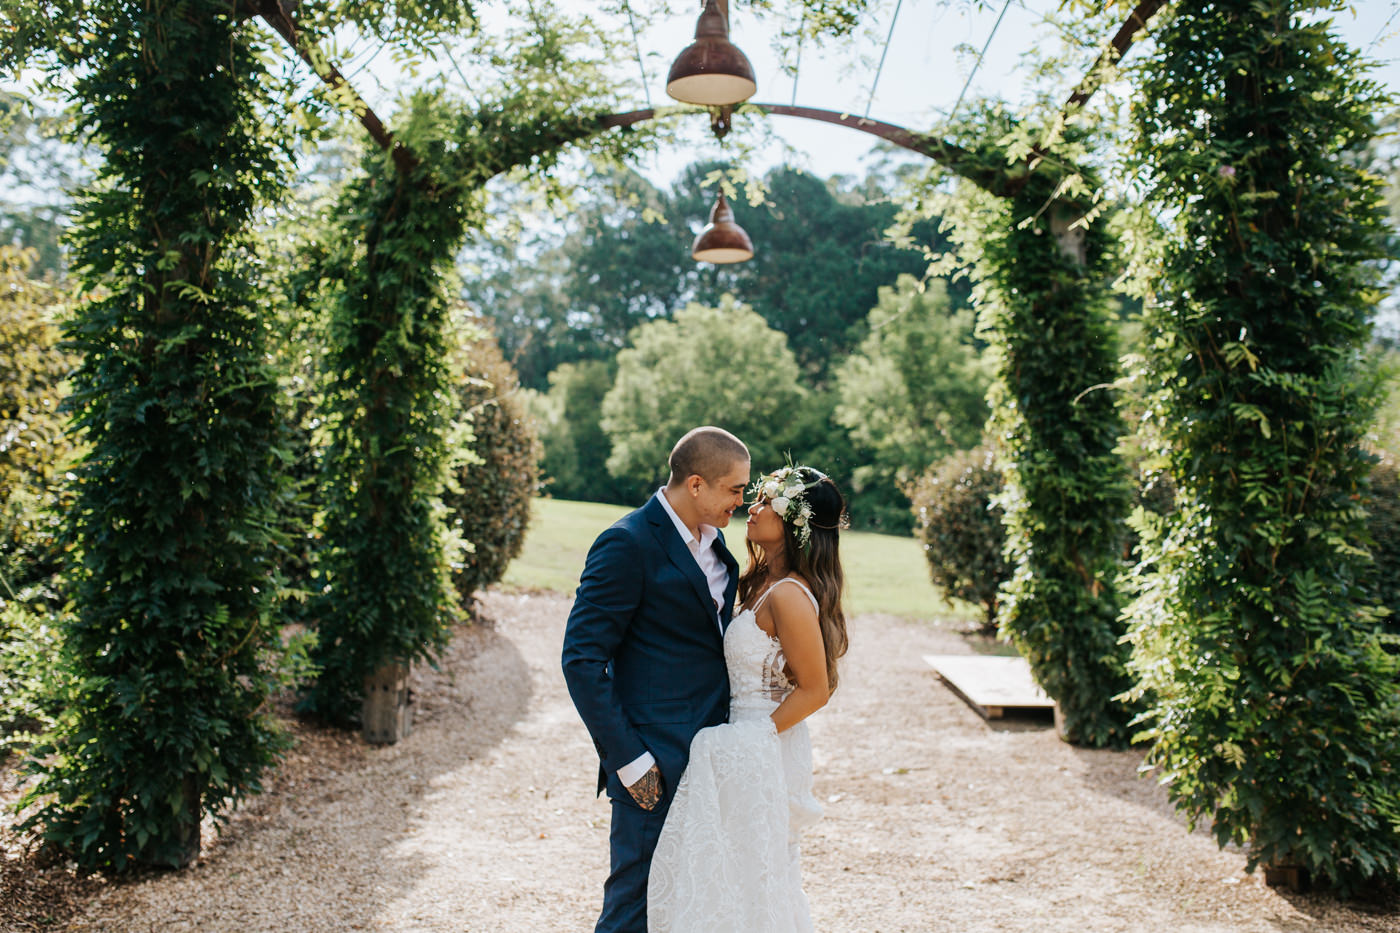 Nick & Vanezza - Fernbank Farm Wedding - Samantha Heather Photography-131.jpg